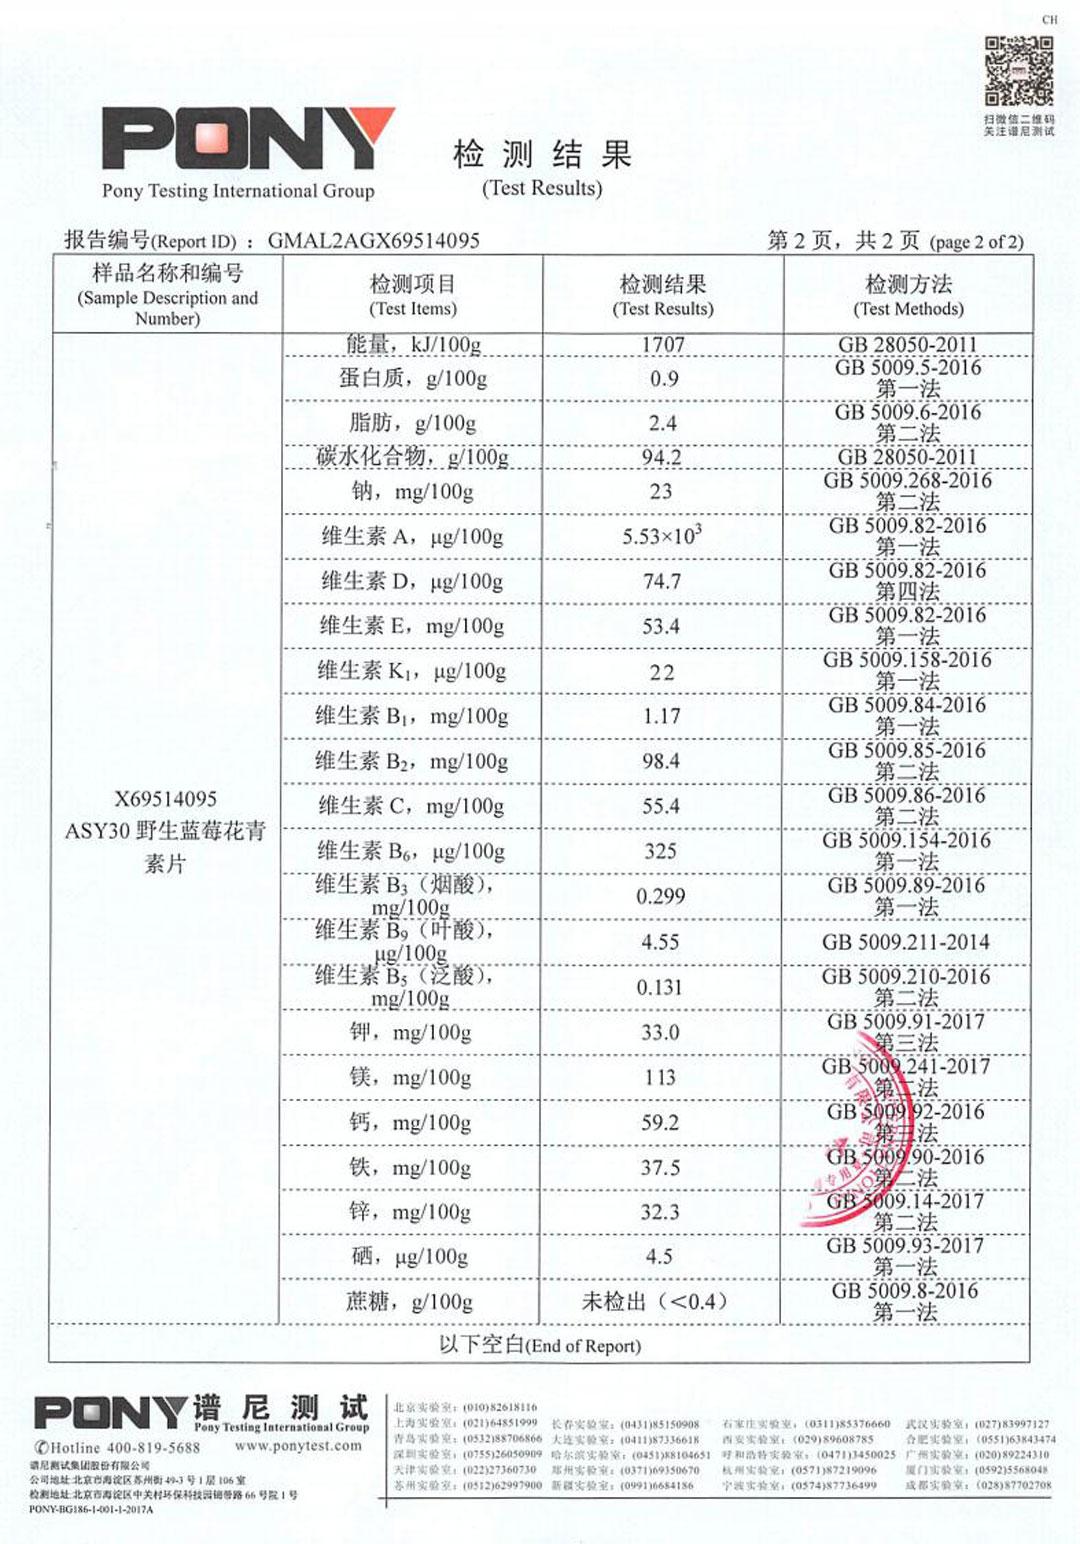 AYS30(ACT)藍莓花青素片營養成分檢測報告2020-(3).jpg